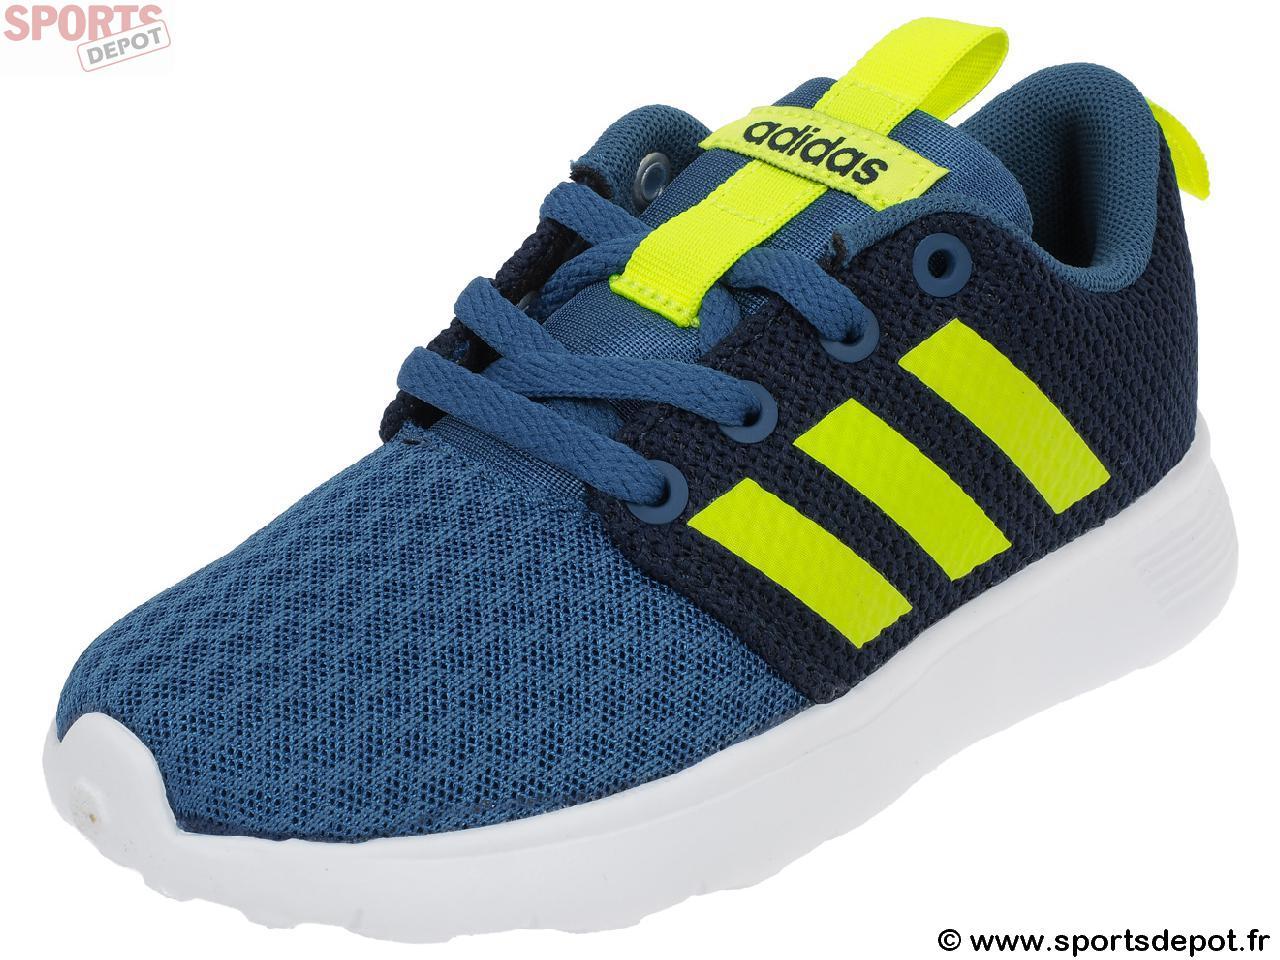 3db5dcb3ef1b4 Acheter Chaussures running running Chaussures mode ADIDAS NEO Swiftnfant  d2eea6